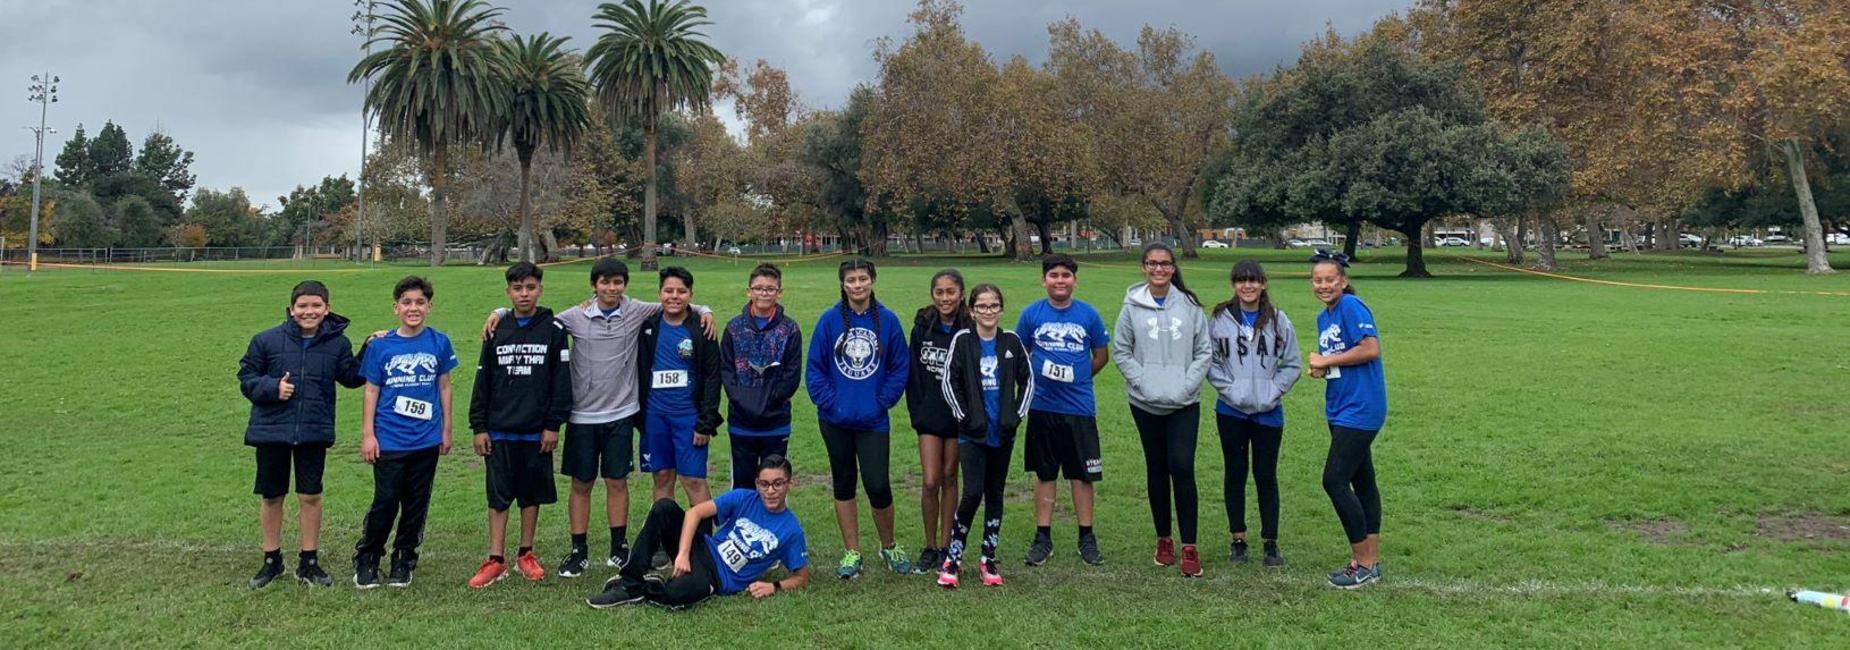 Running Club Event